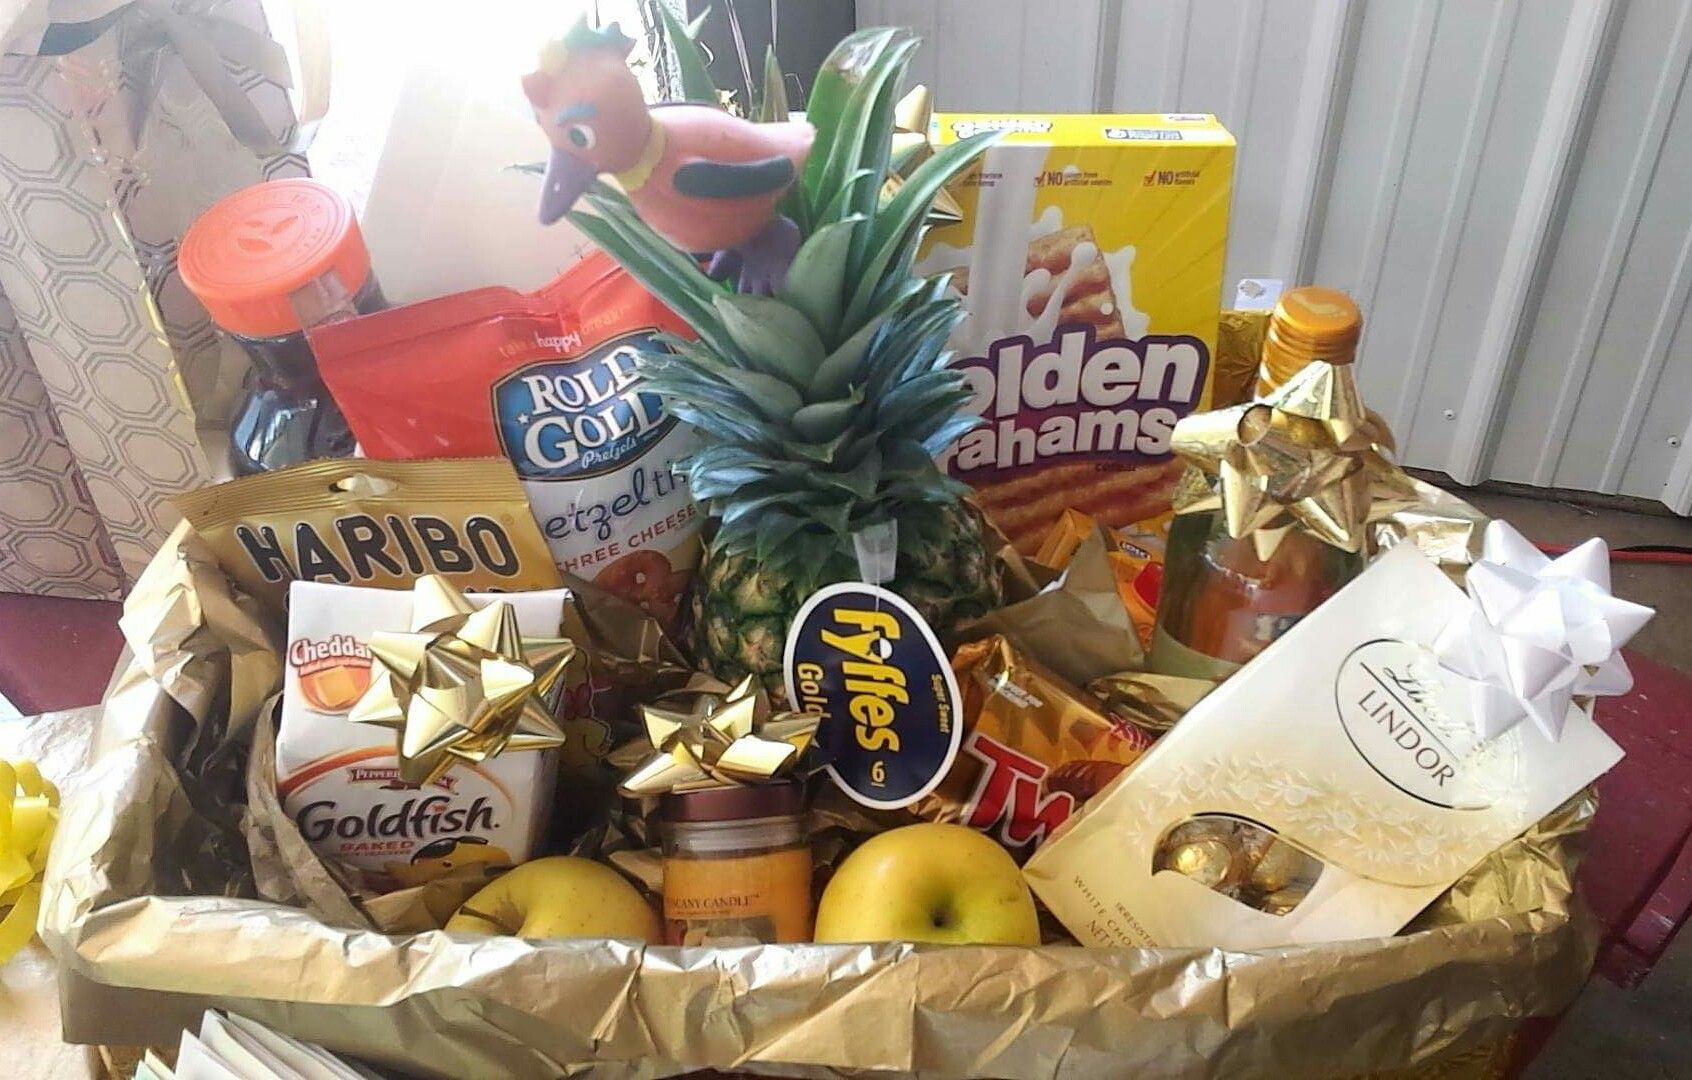 Golden Gifts For A Golden 50th Anniversary! #golden